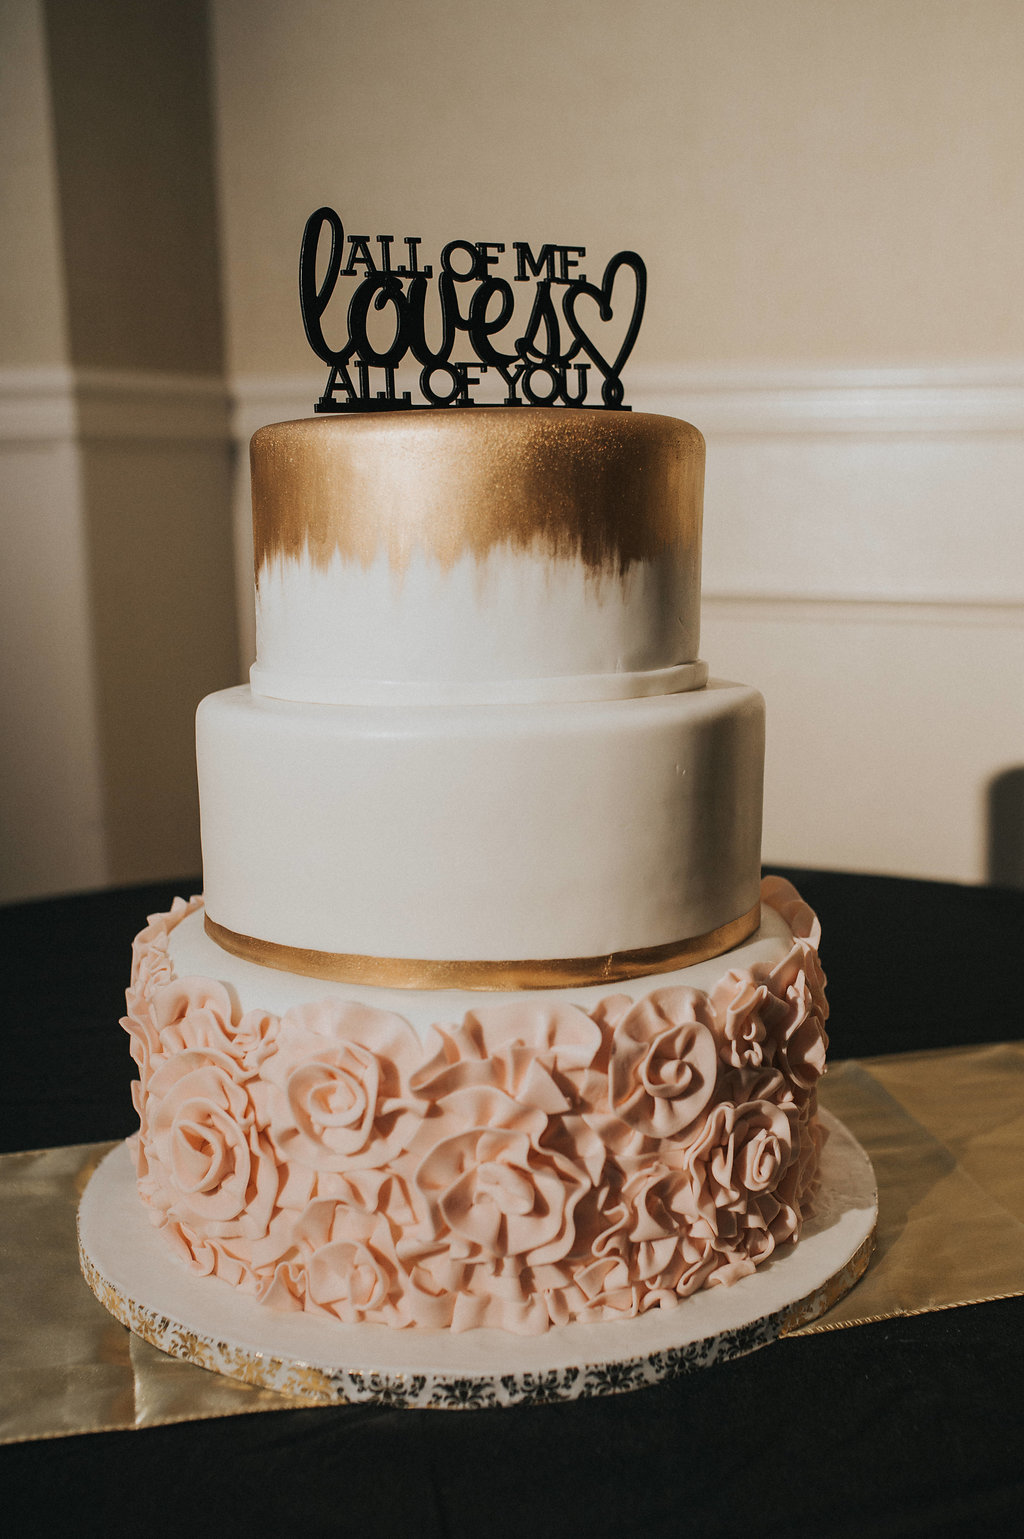 Morgan-and-Cory-Ocean-City-Wedding-406.jpg